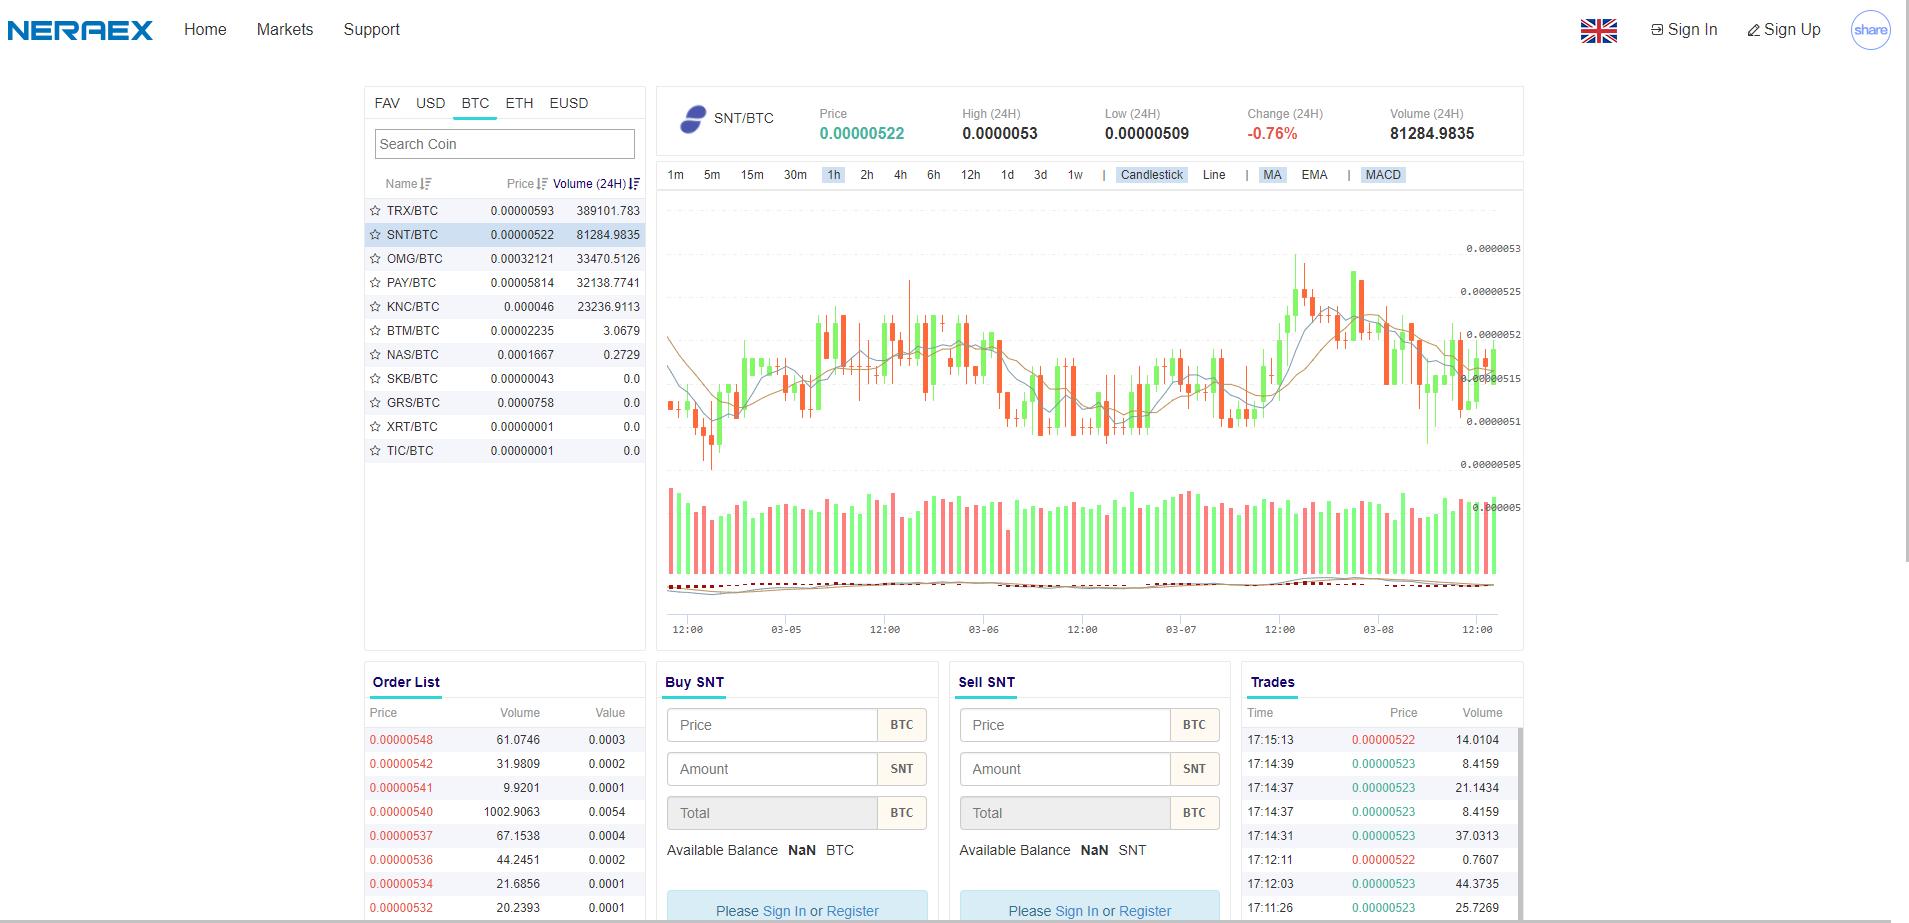 Neraex Trading View